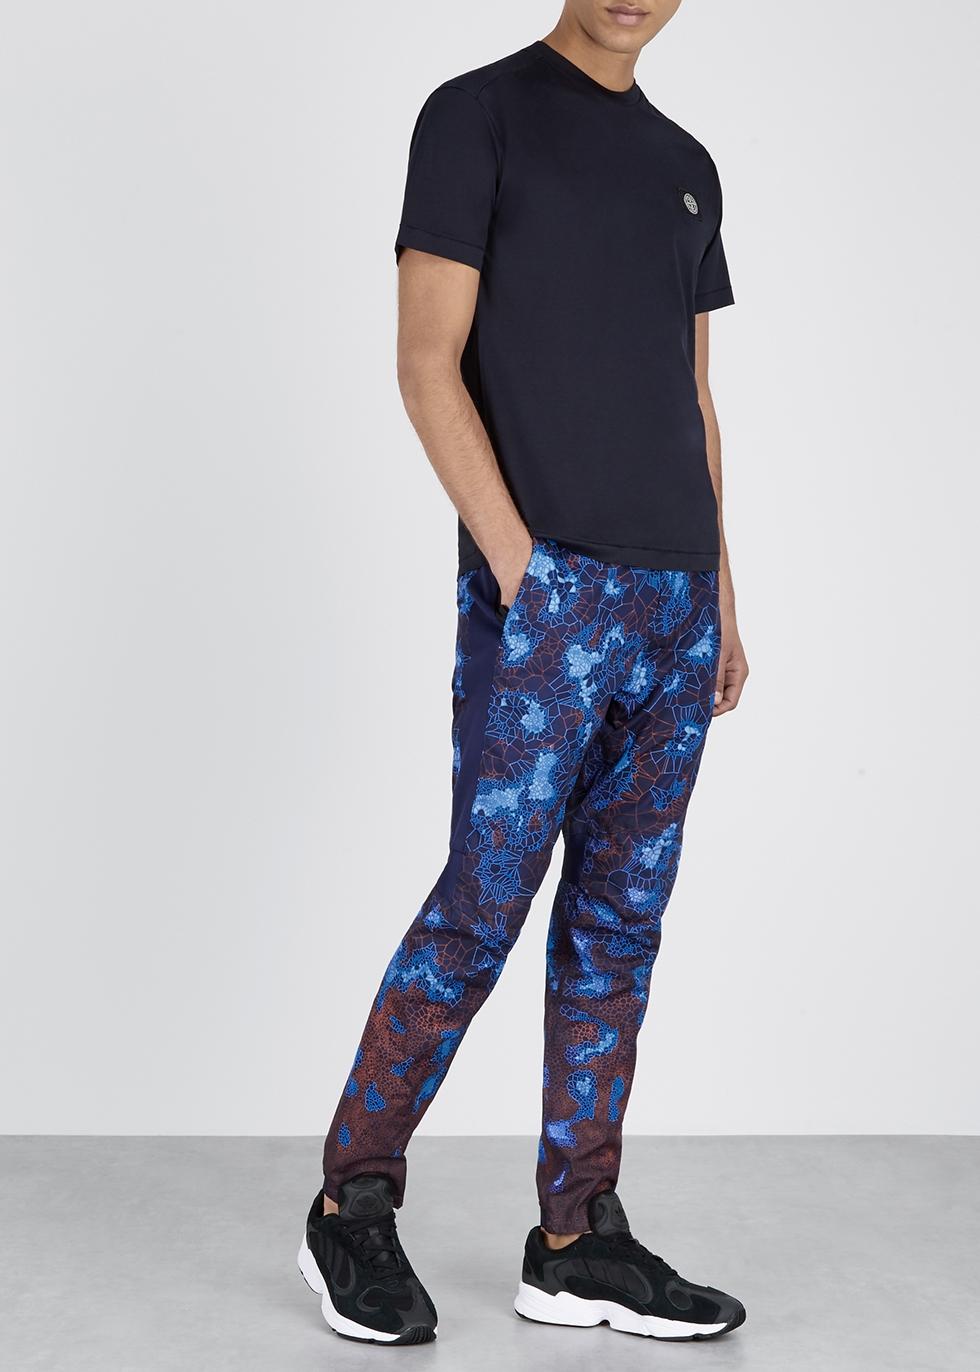 Heat-reactive navy cotton trousers - Stone Island